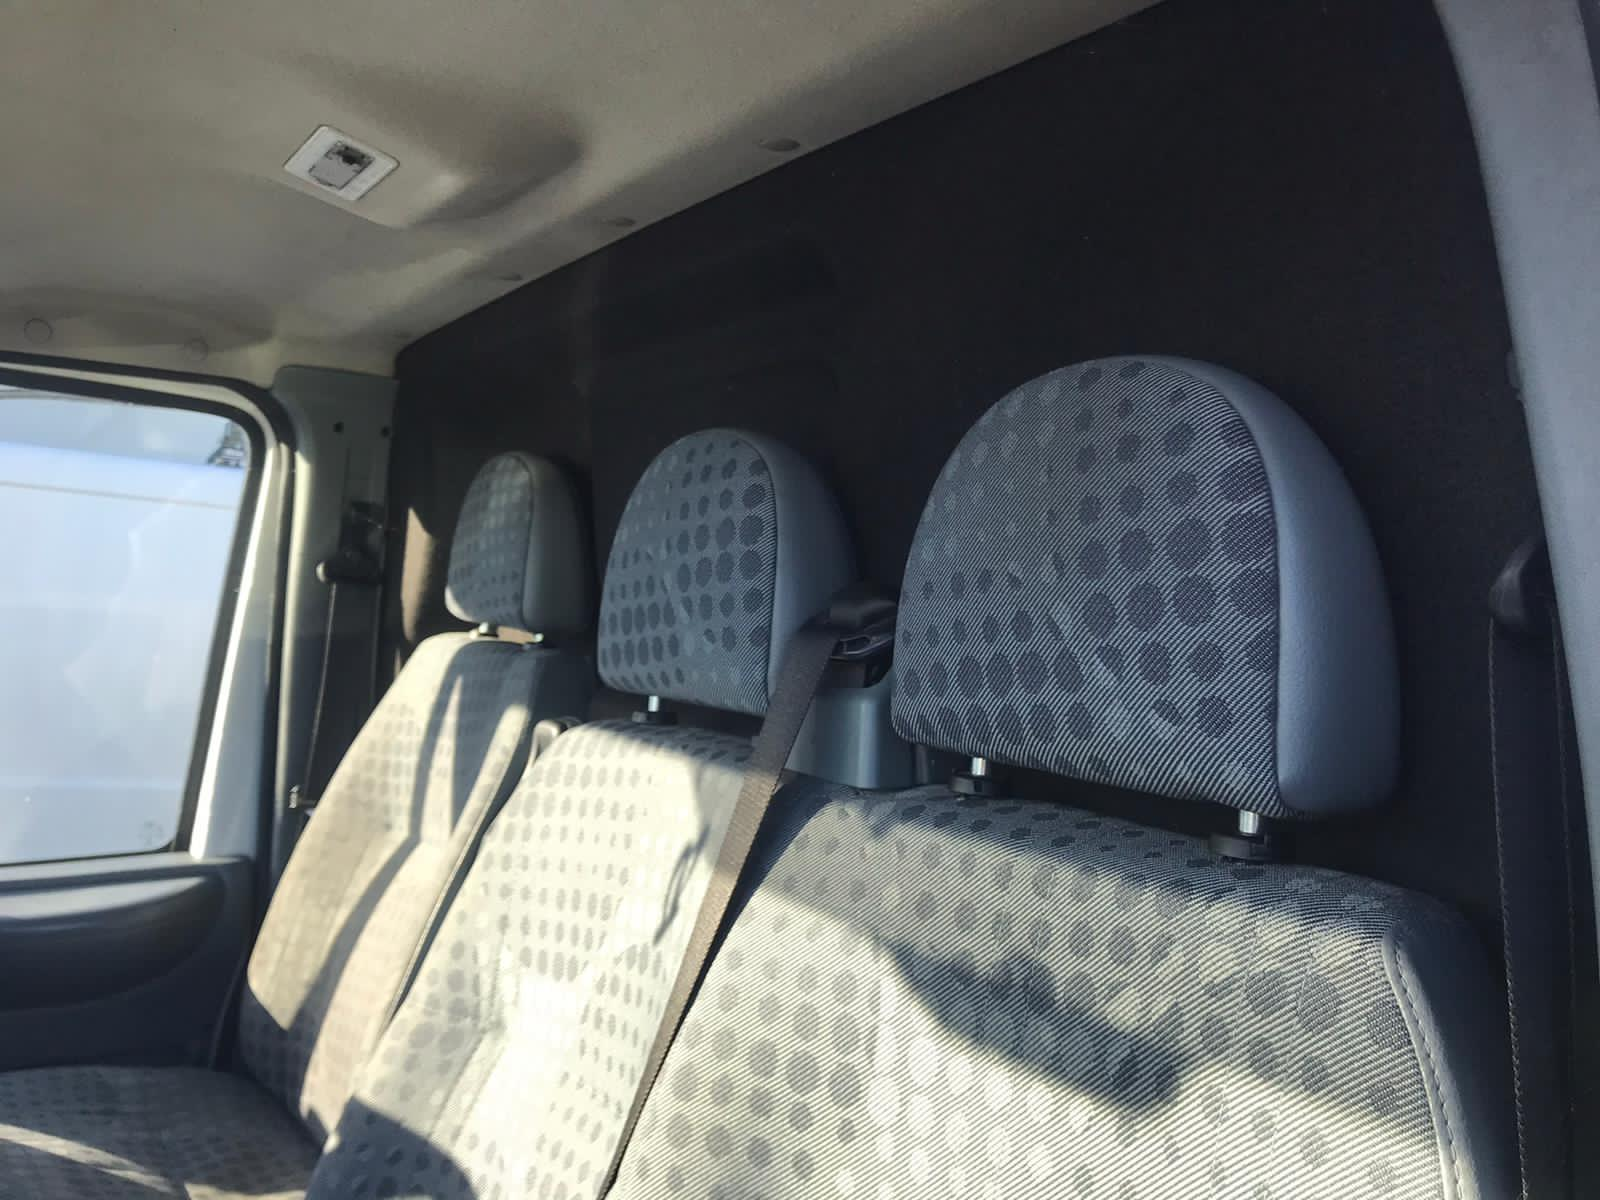 (RESERVE MET) Ford Transit 2.2 TDCI 100 T260 2014 Model - SWB - Low Roof -NO VAT SAVE 20% - Image 22 of 22